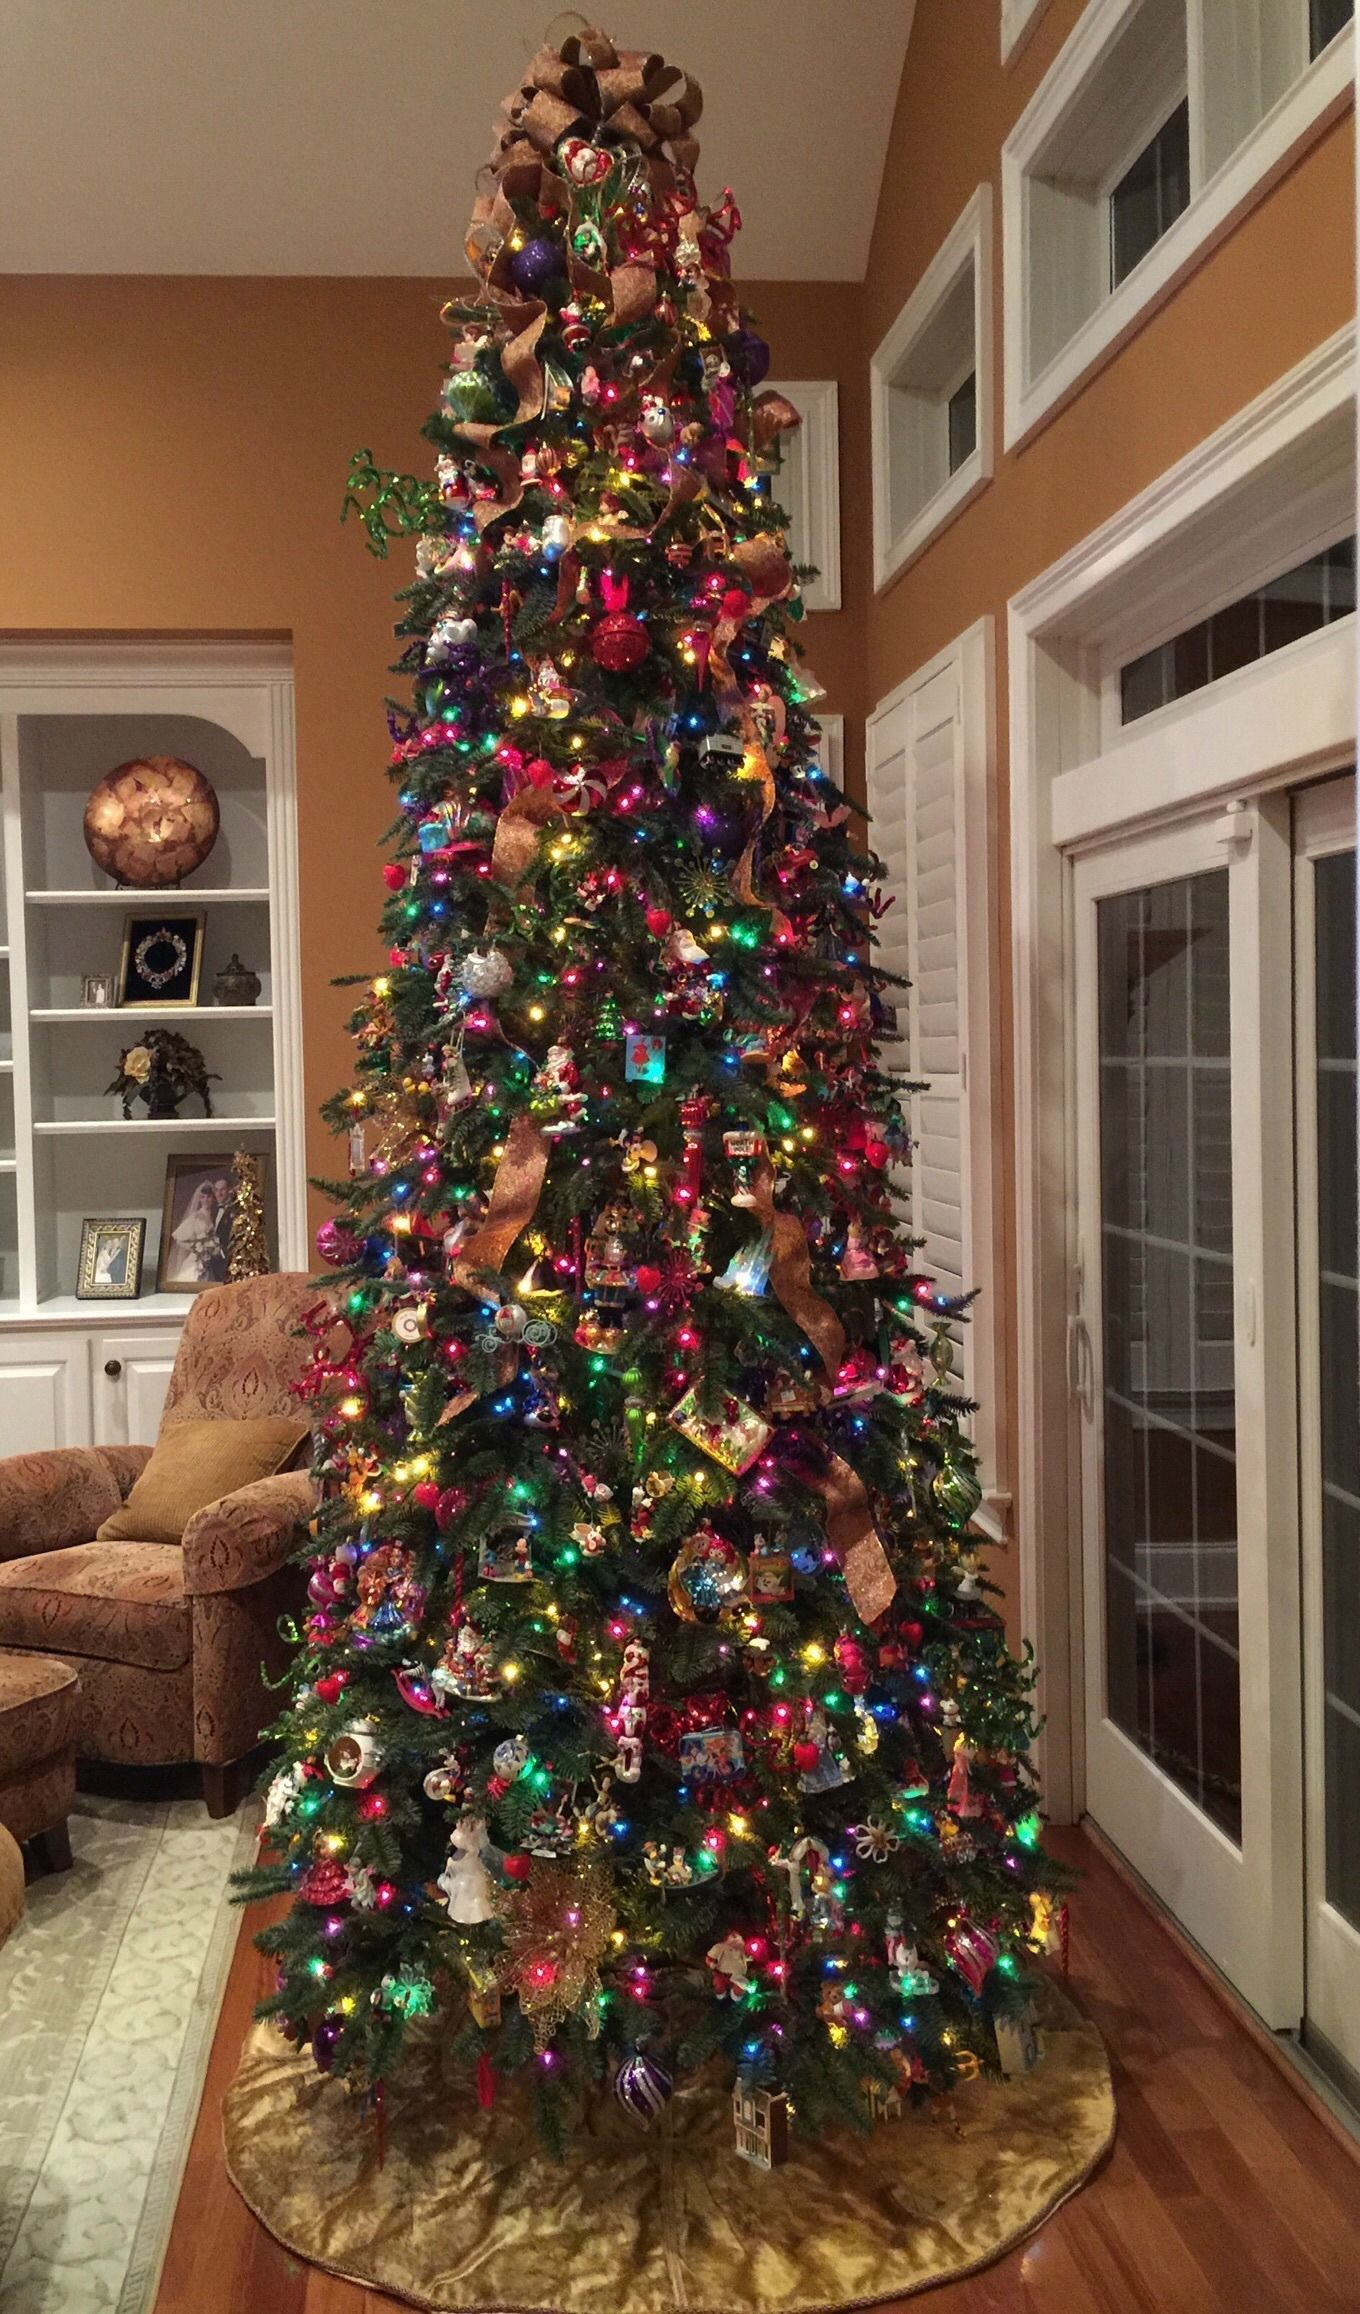 Photo Credit Joseph Turchi - Frontgate Holiday Decor Challenge 2014